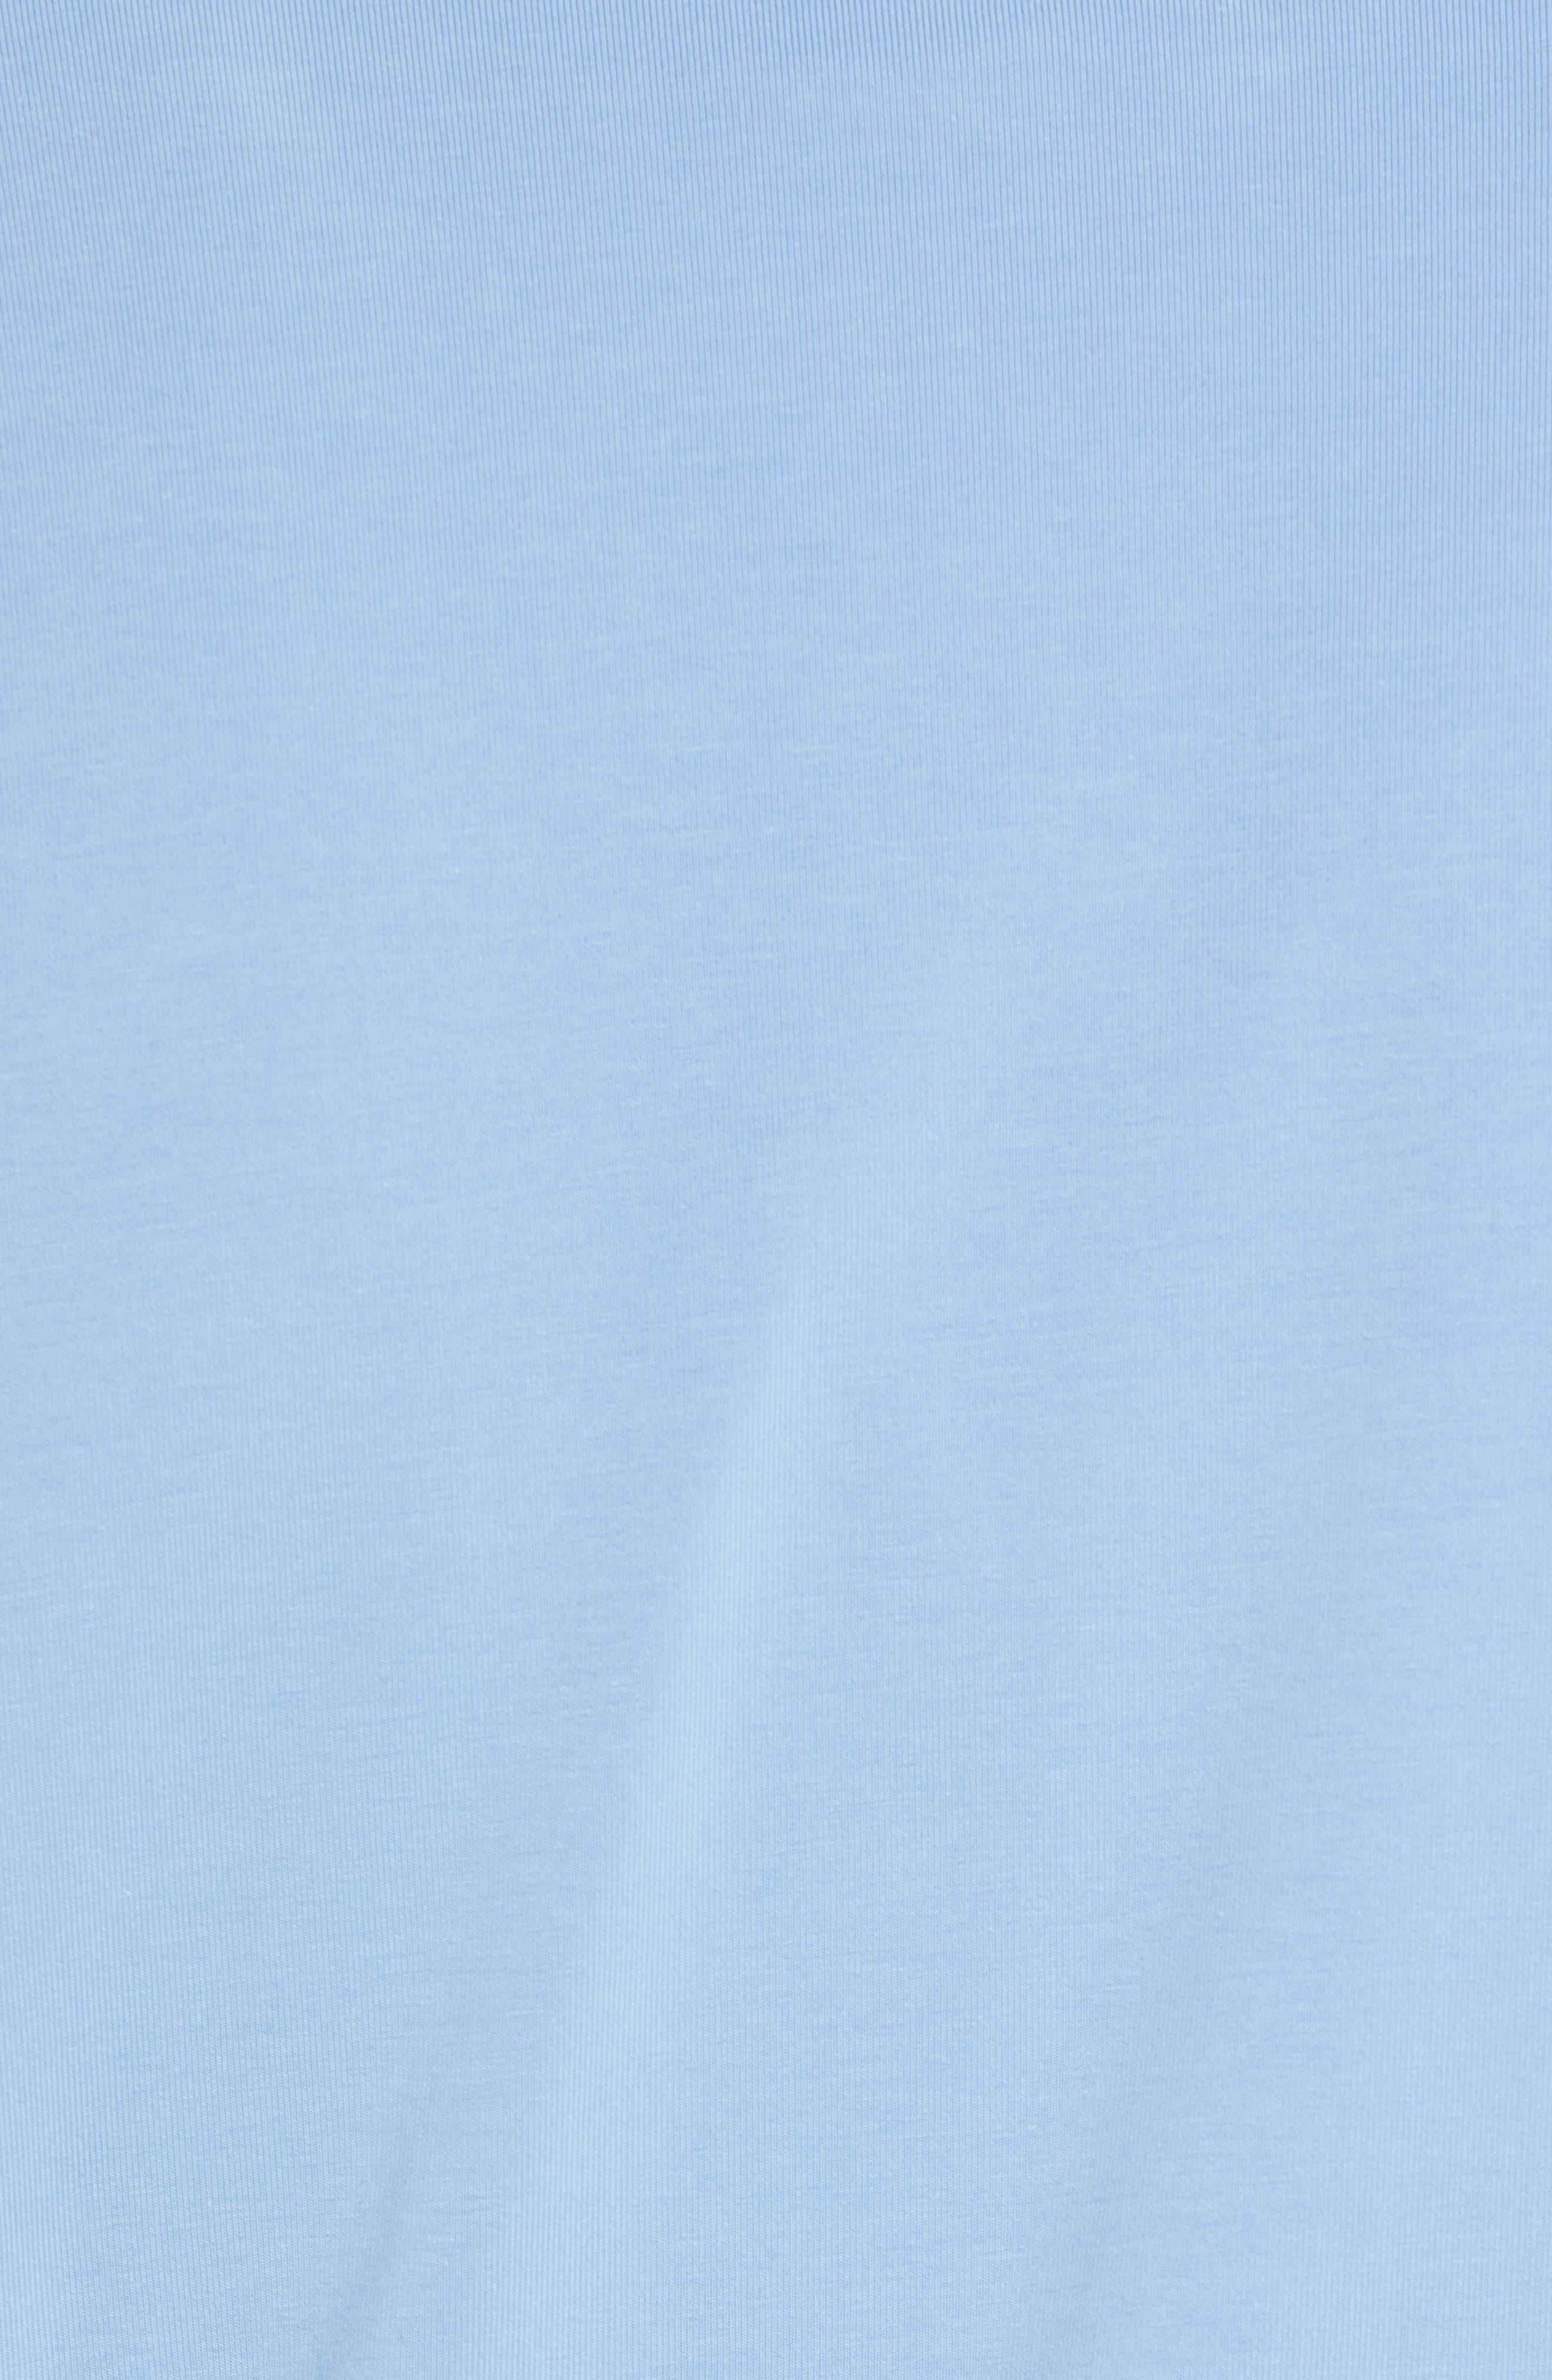 'Strange Love' Trim Fit Wrinkle Resistant Quarter Zip Jacket,                             Alternate thumbnail 6, color,                             ALLURE